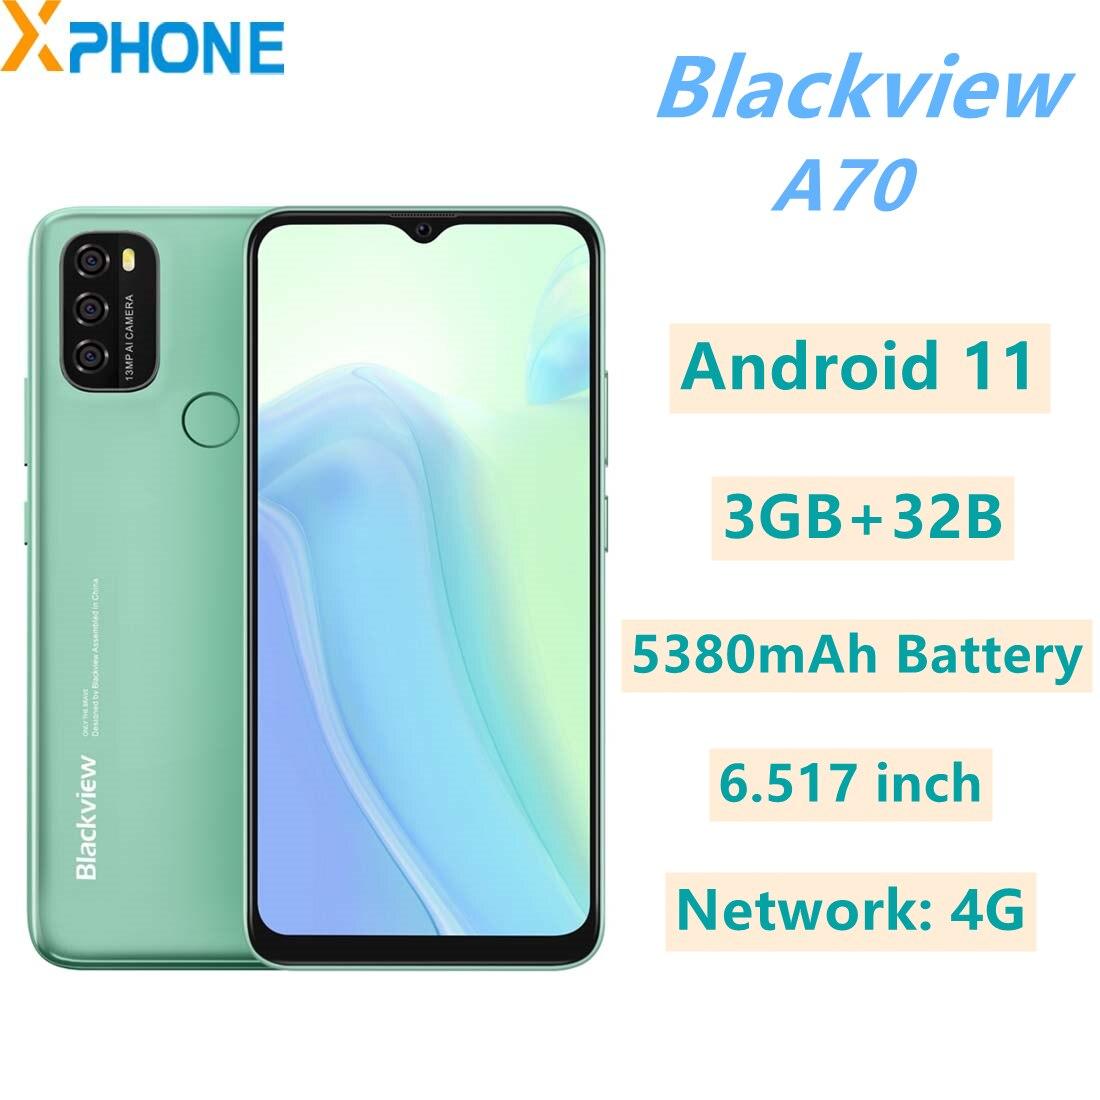 Blackview A70, 3 Гб оперативной памяти, 32 Гб встроенной памяти, Android 11 6,517 дюймов 5380 мА/ч, Батарея сети 4G Face ID и идентификация по отпечатку пальца моби...